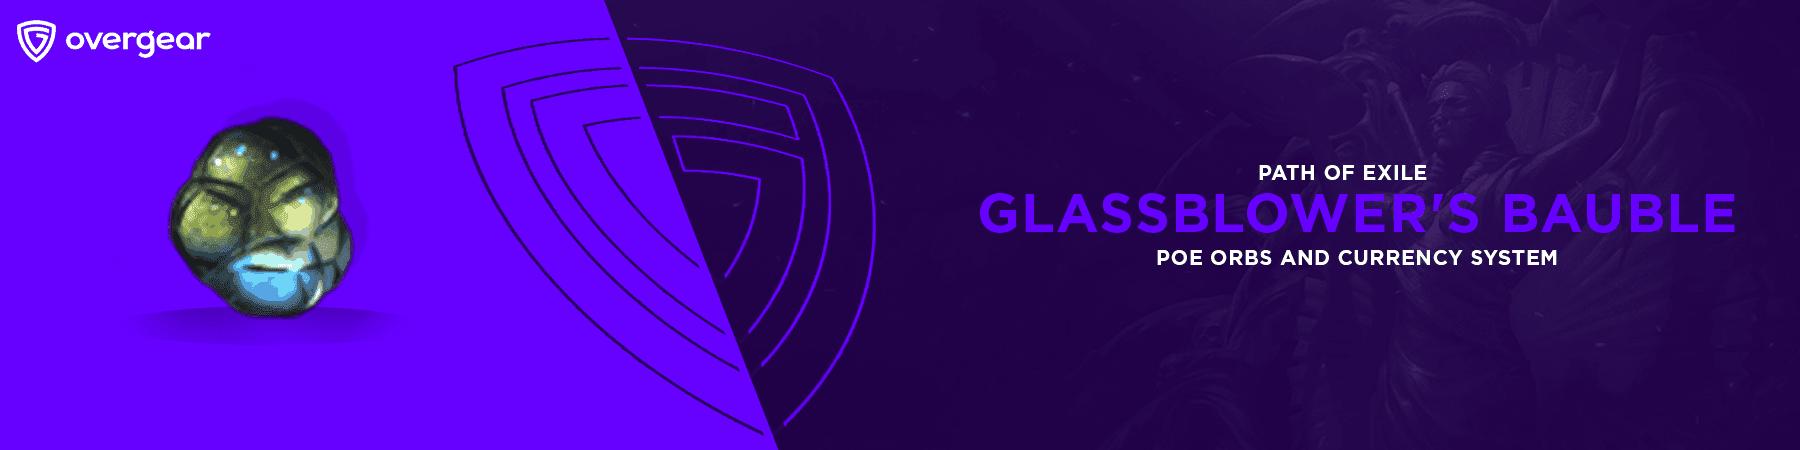 Glassblower's Bauble